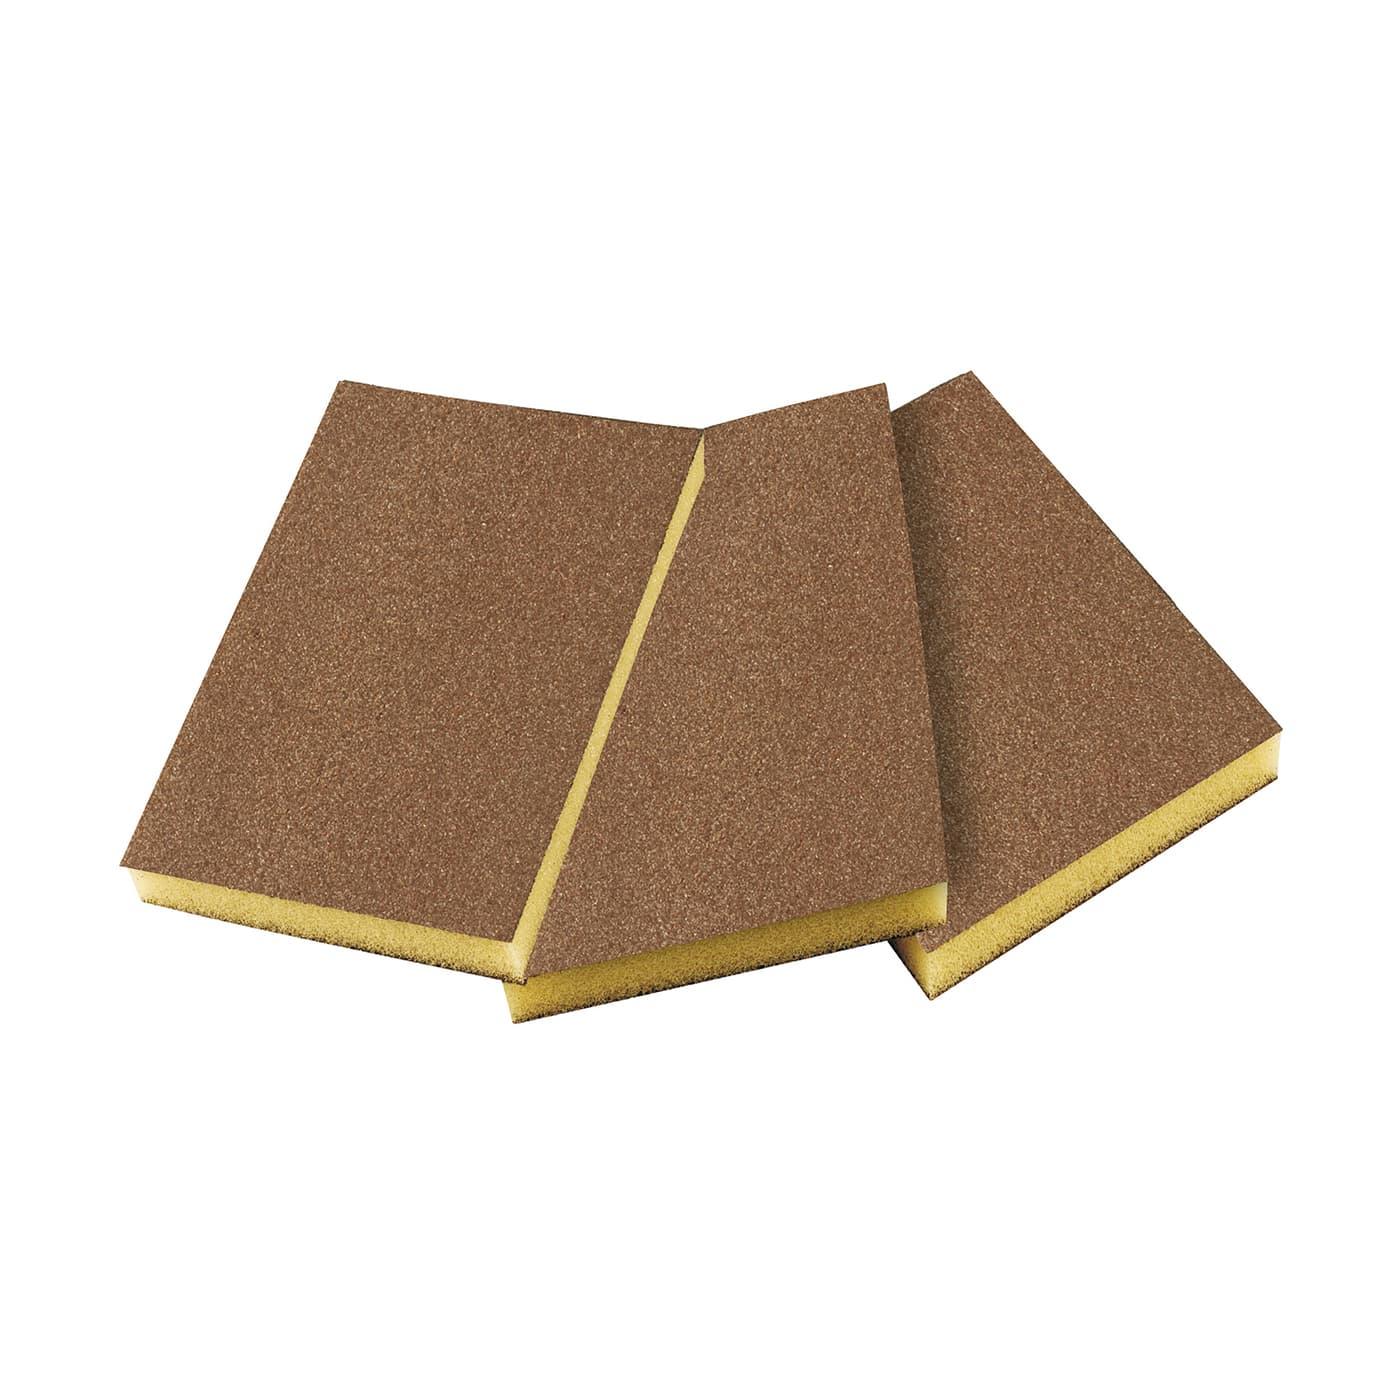 920 Sanding sponges (2×2)